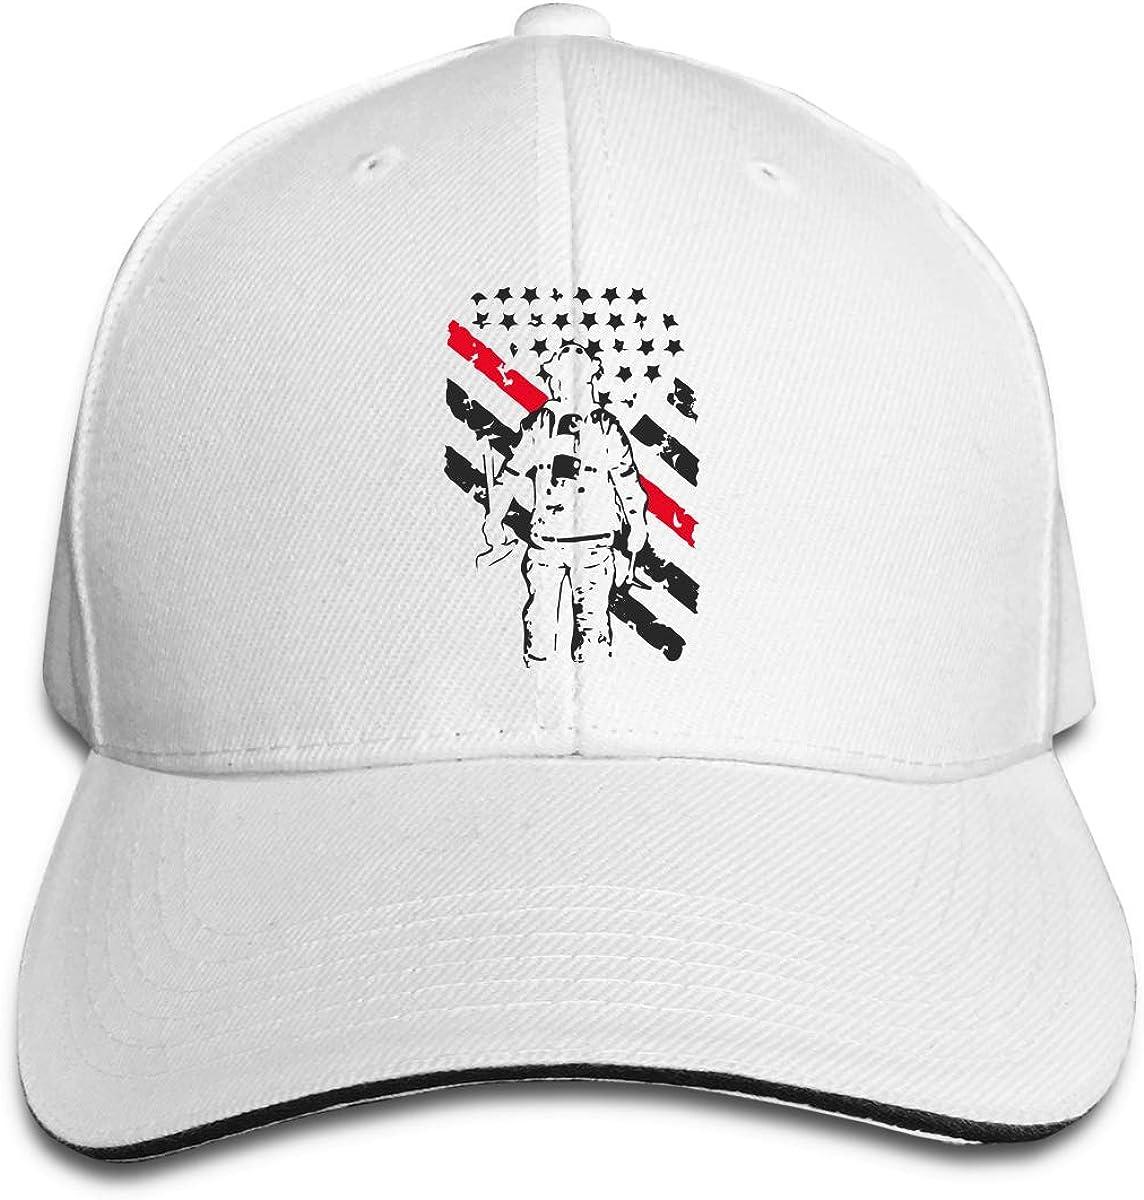 Firefighter Thin Red Line Outdoor Snapback Sandwich Cap Adjustable Baseball Hat Plain Cap